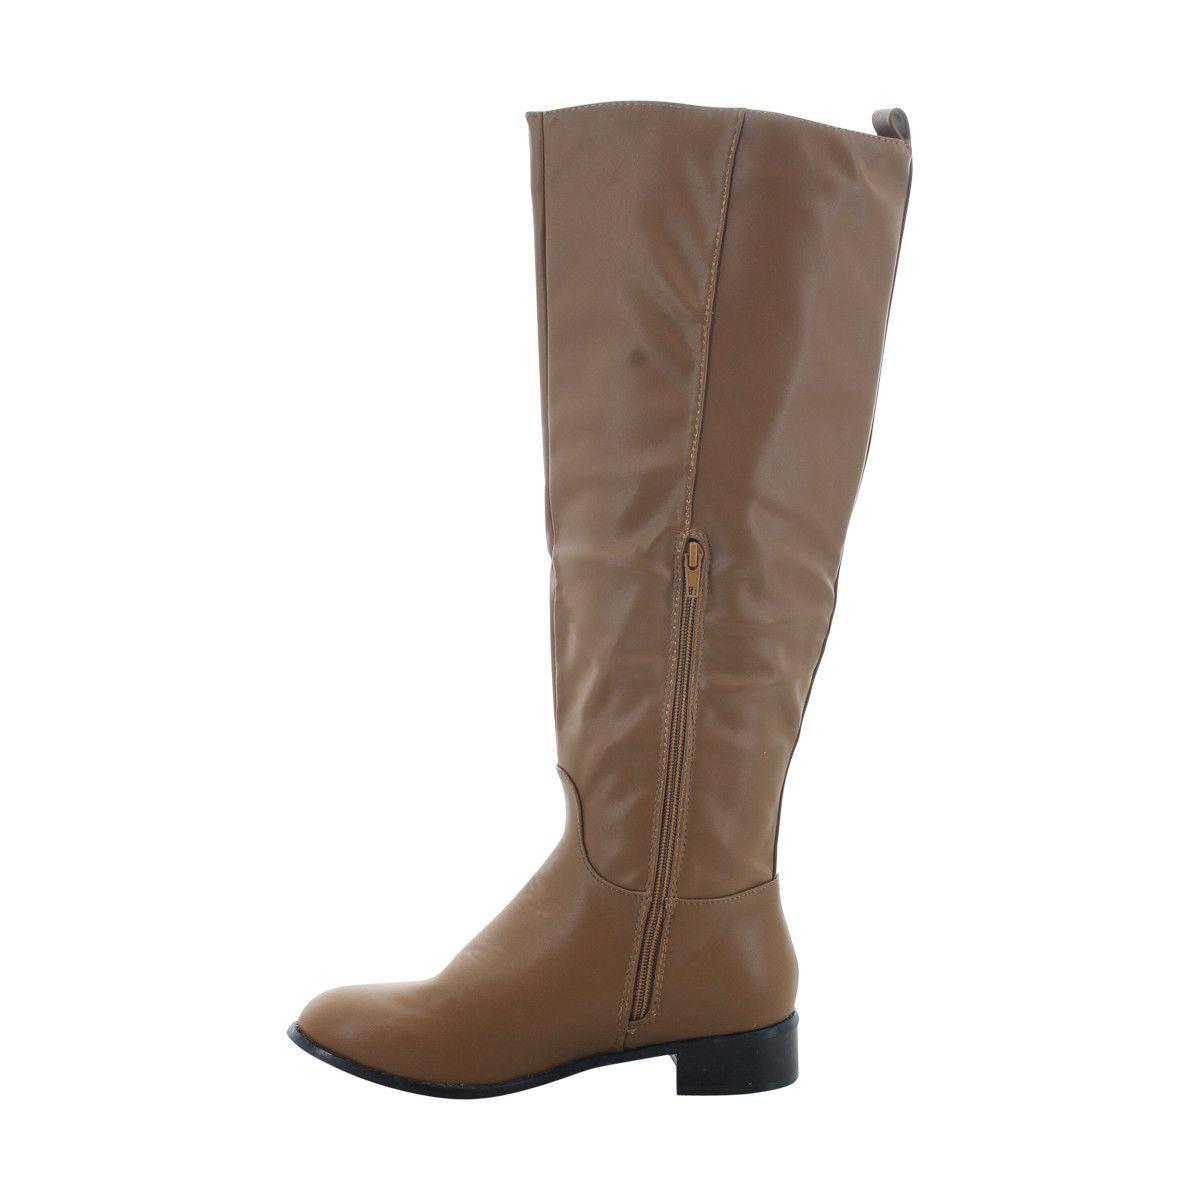 Hooked - Women's Plain Riding Boot - Mushroom